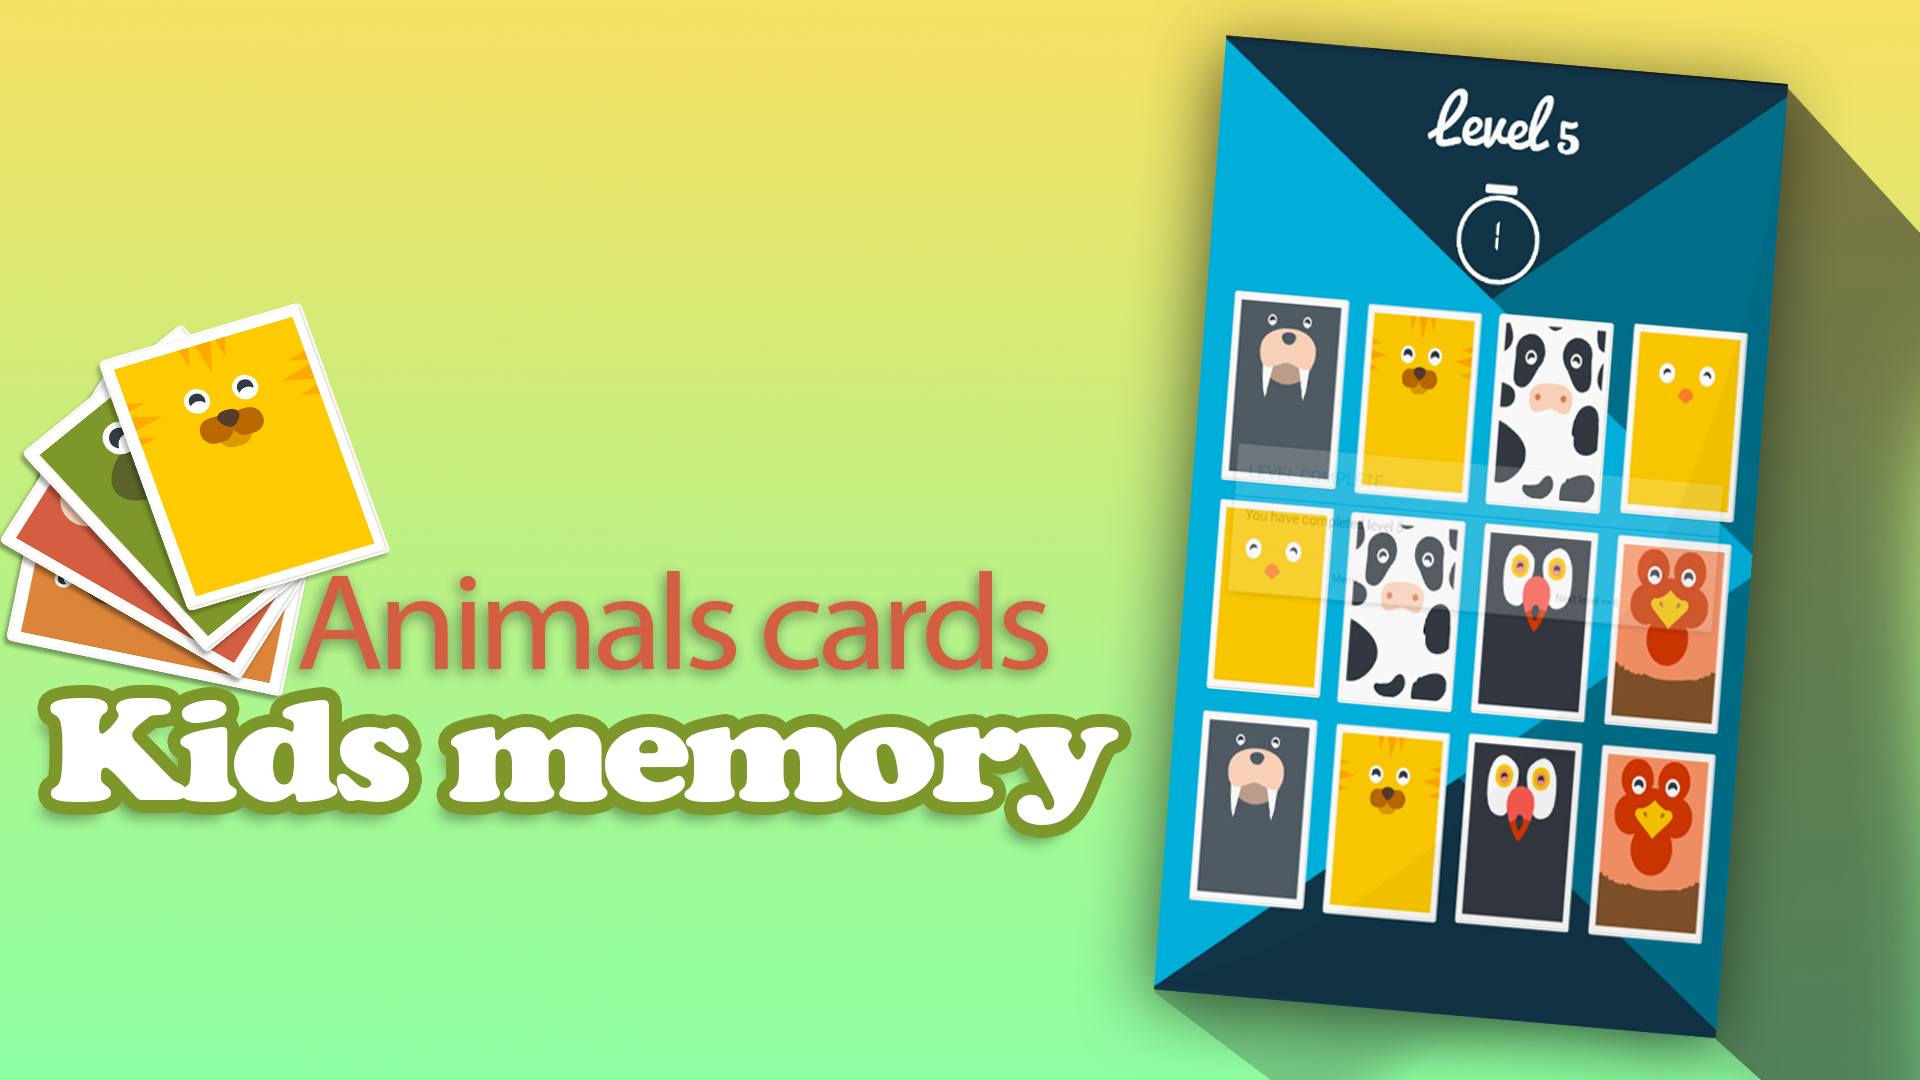 Kids memory: Animals cards